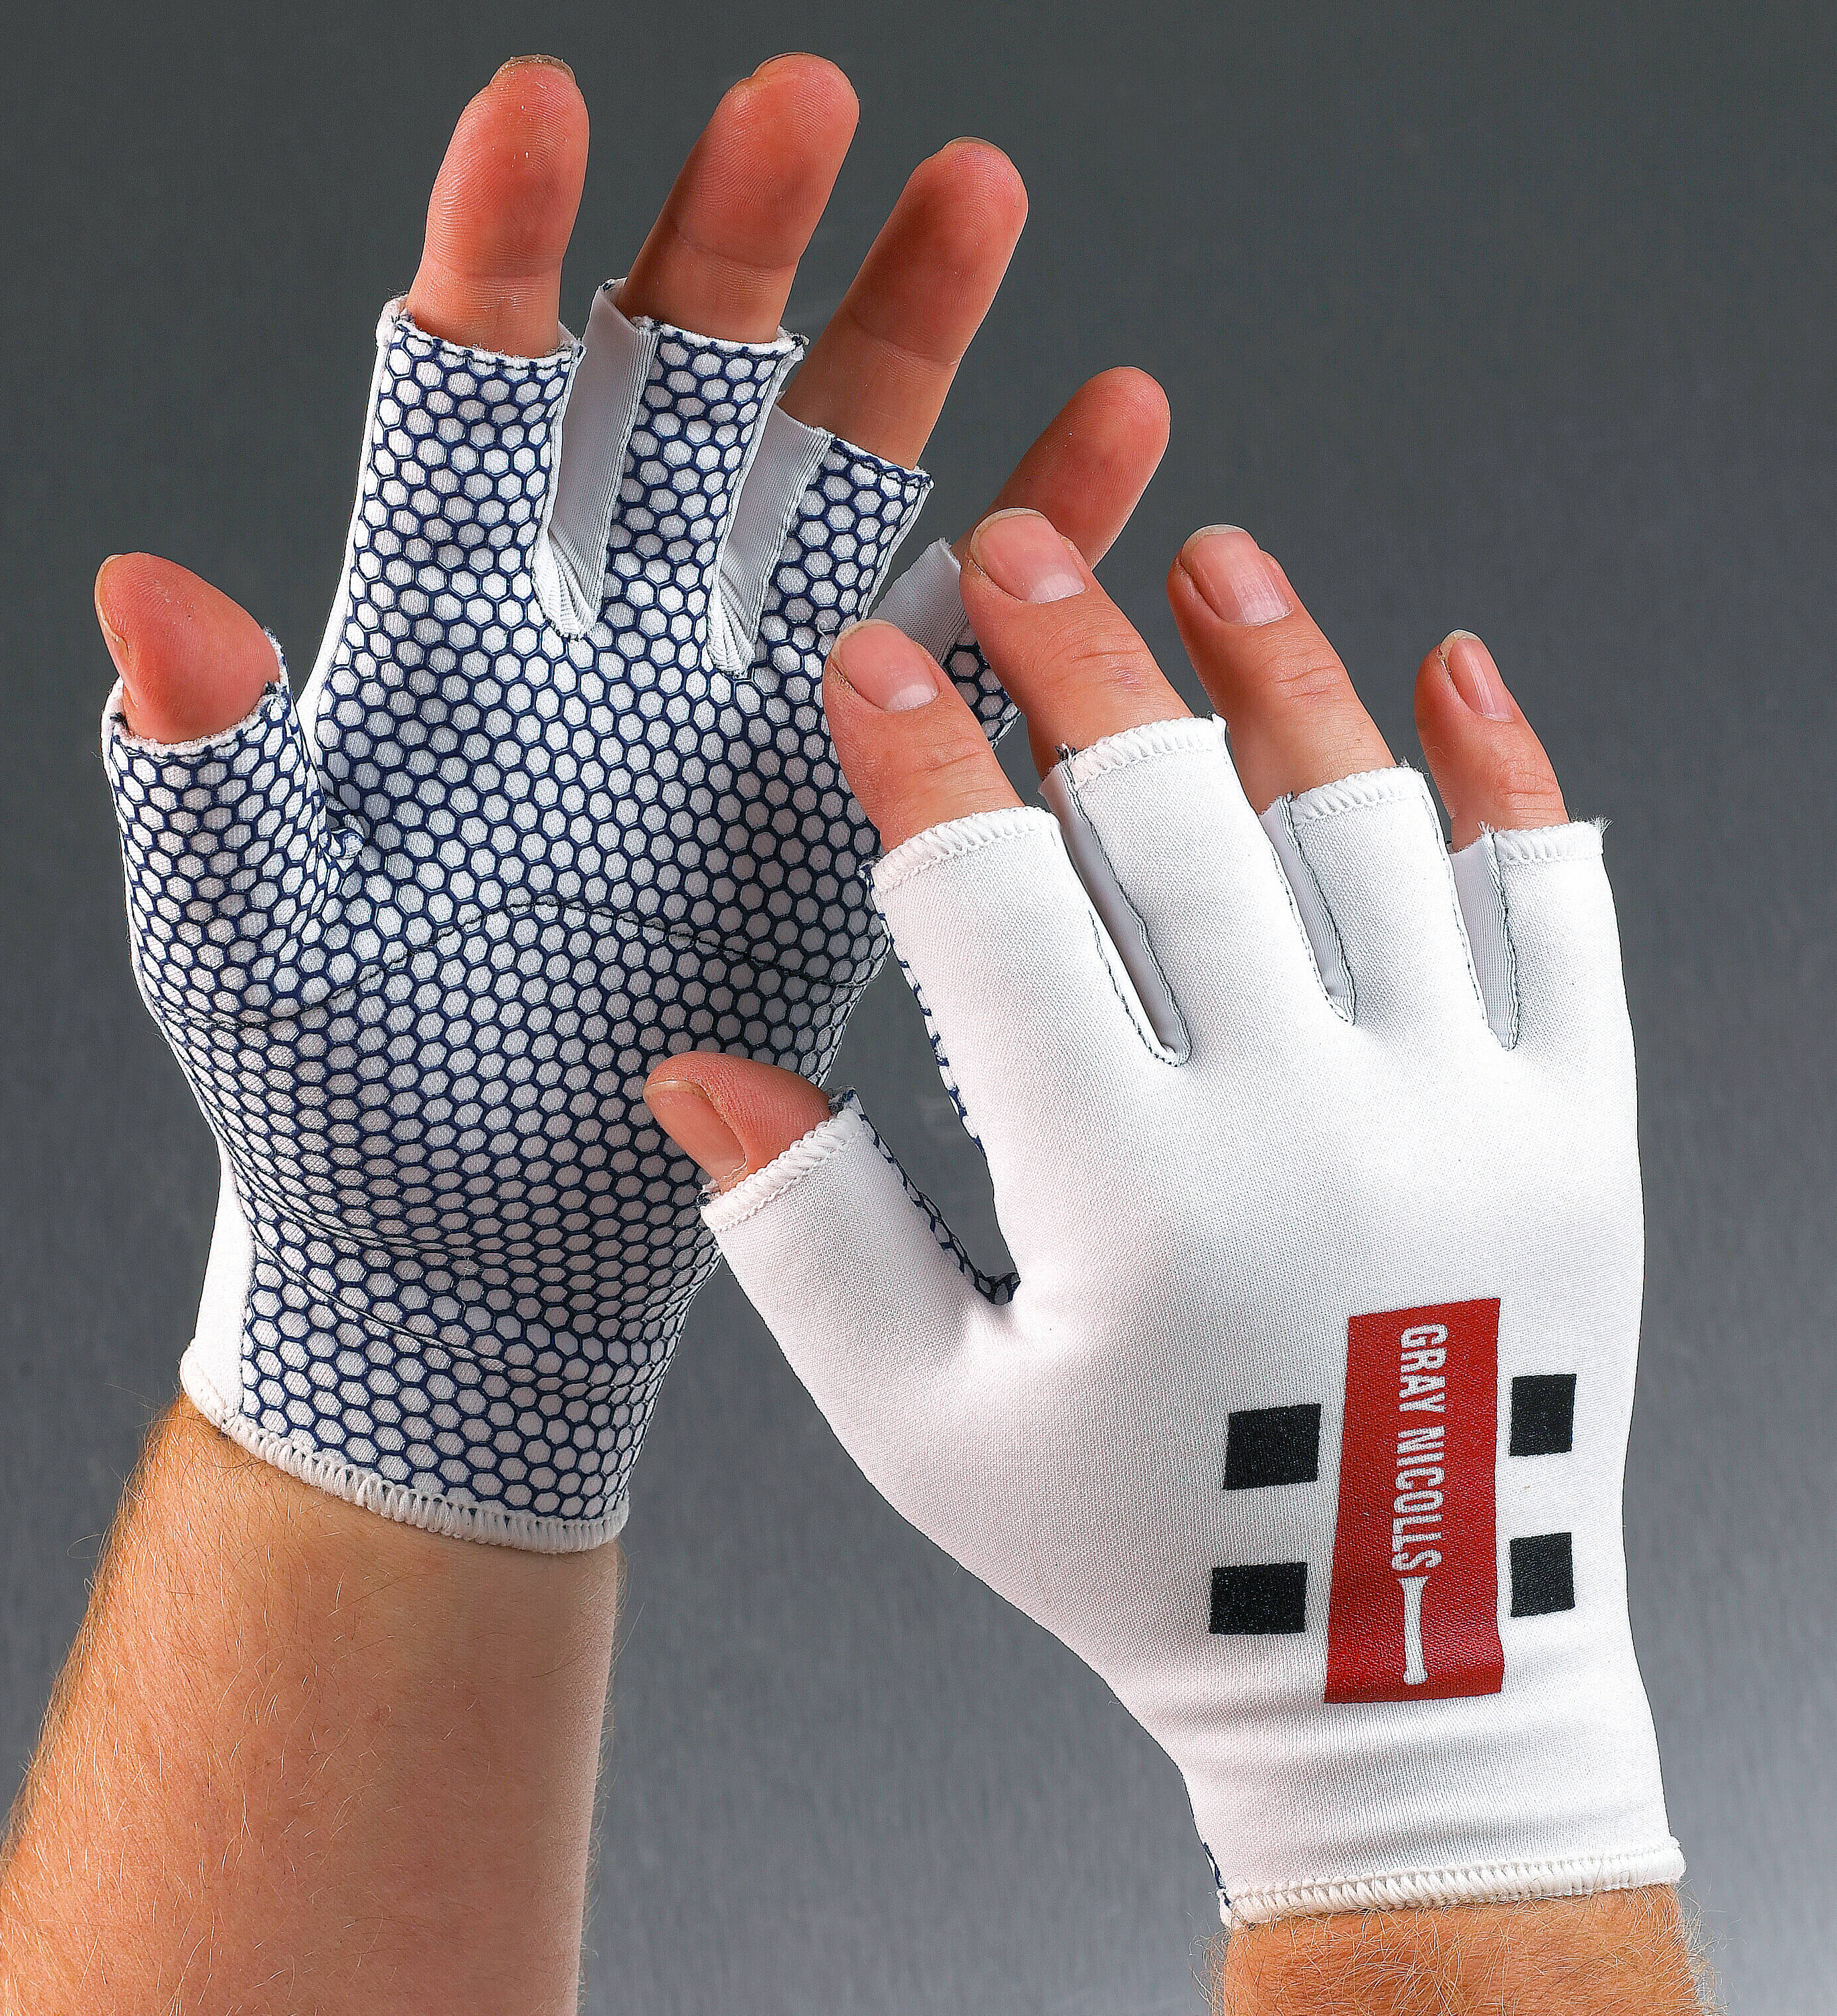 Kookaburra Cricket Fielding Practice Gloves